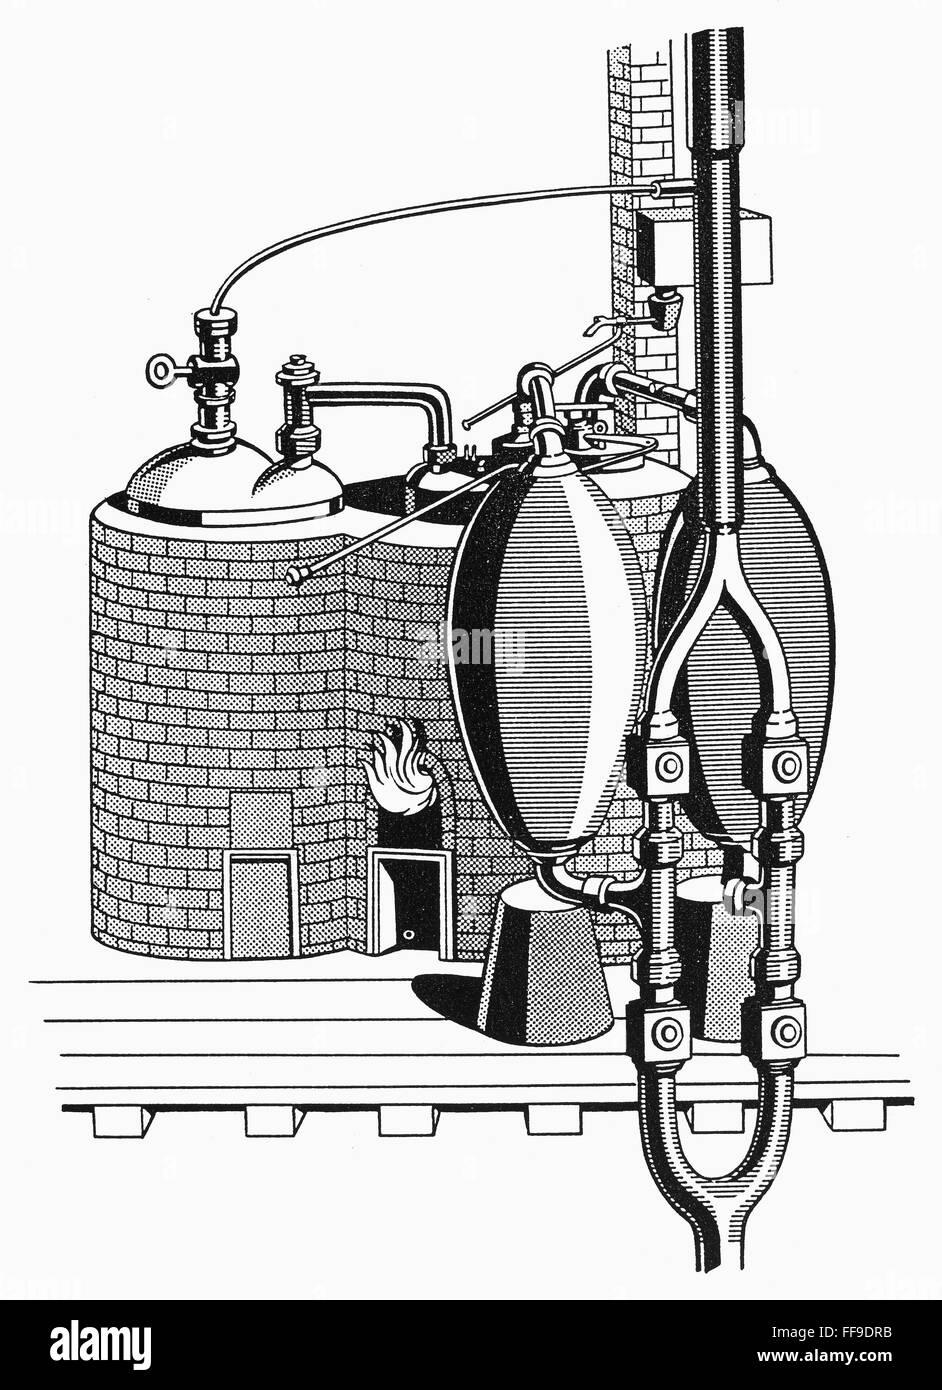 savery s steam engine diagram savery steam engine 1698 nschematic diagram of